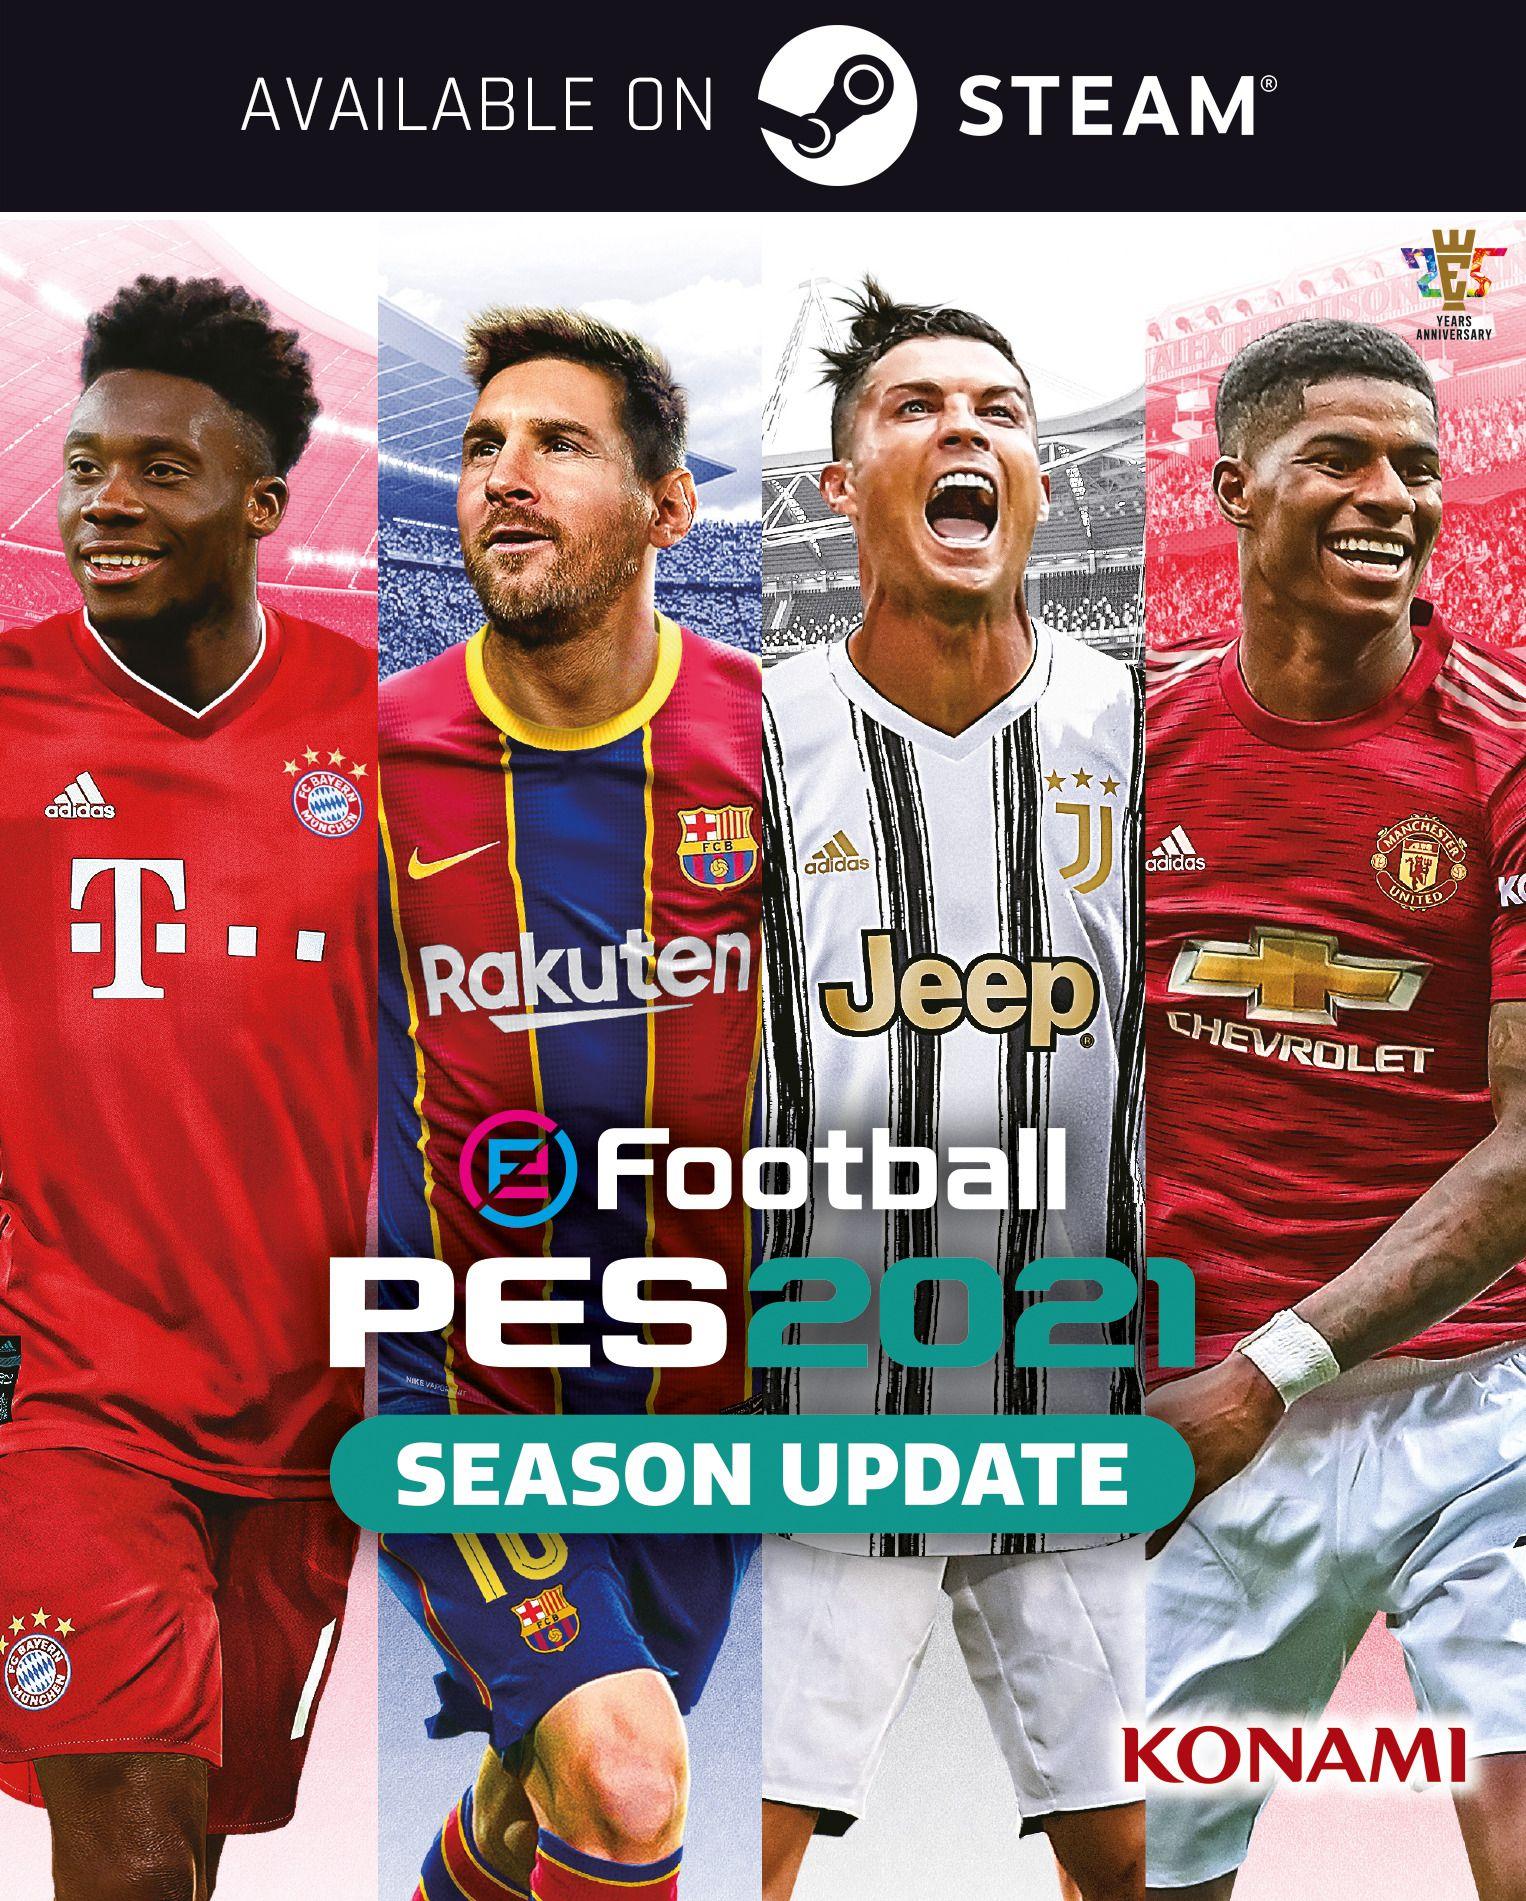 PES 2021 copertina steam